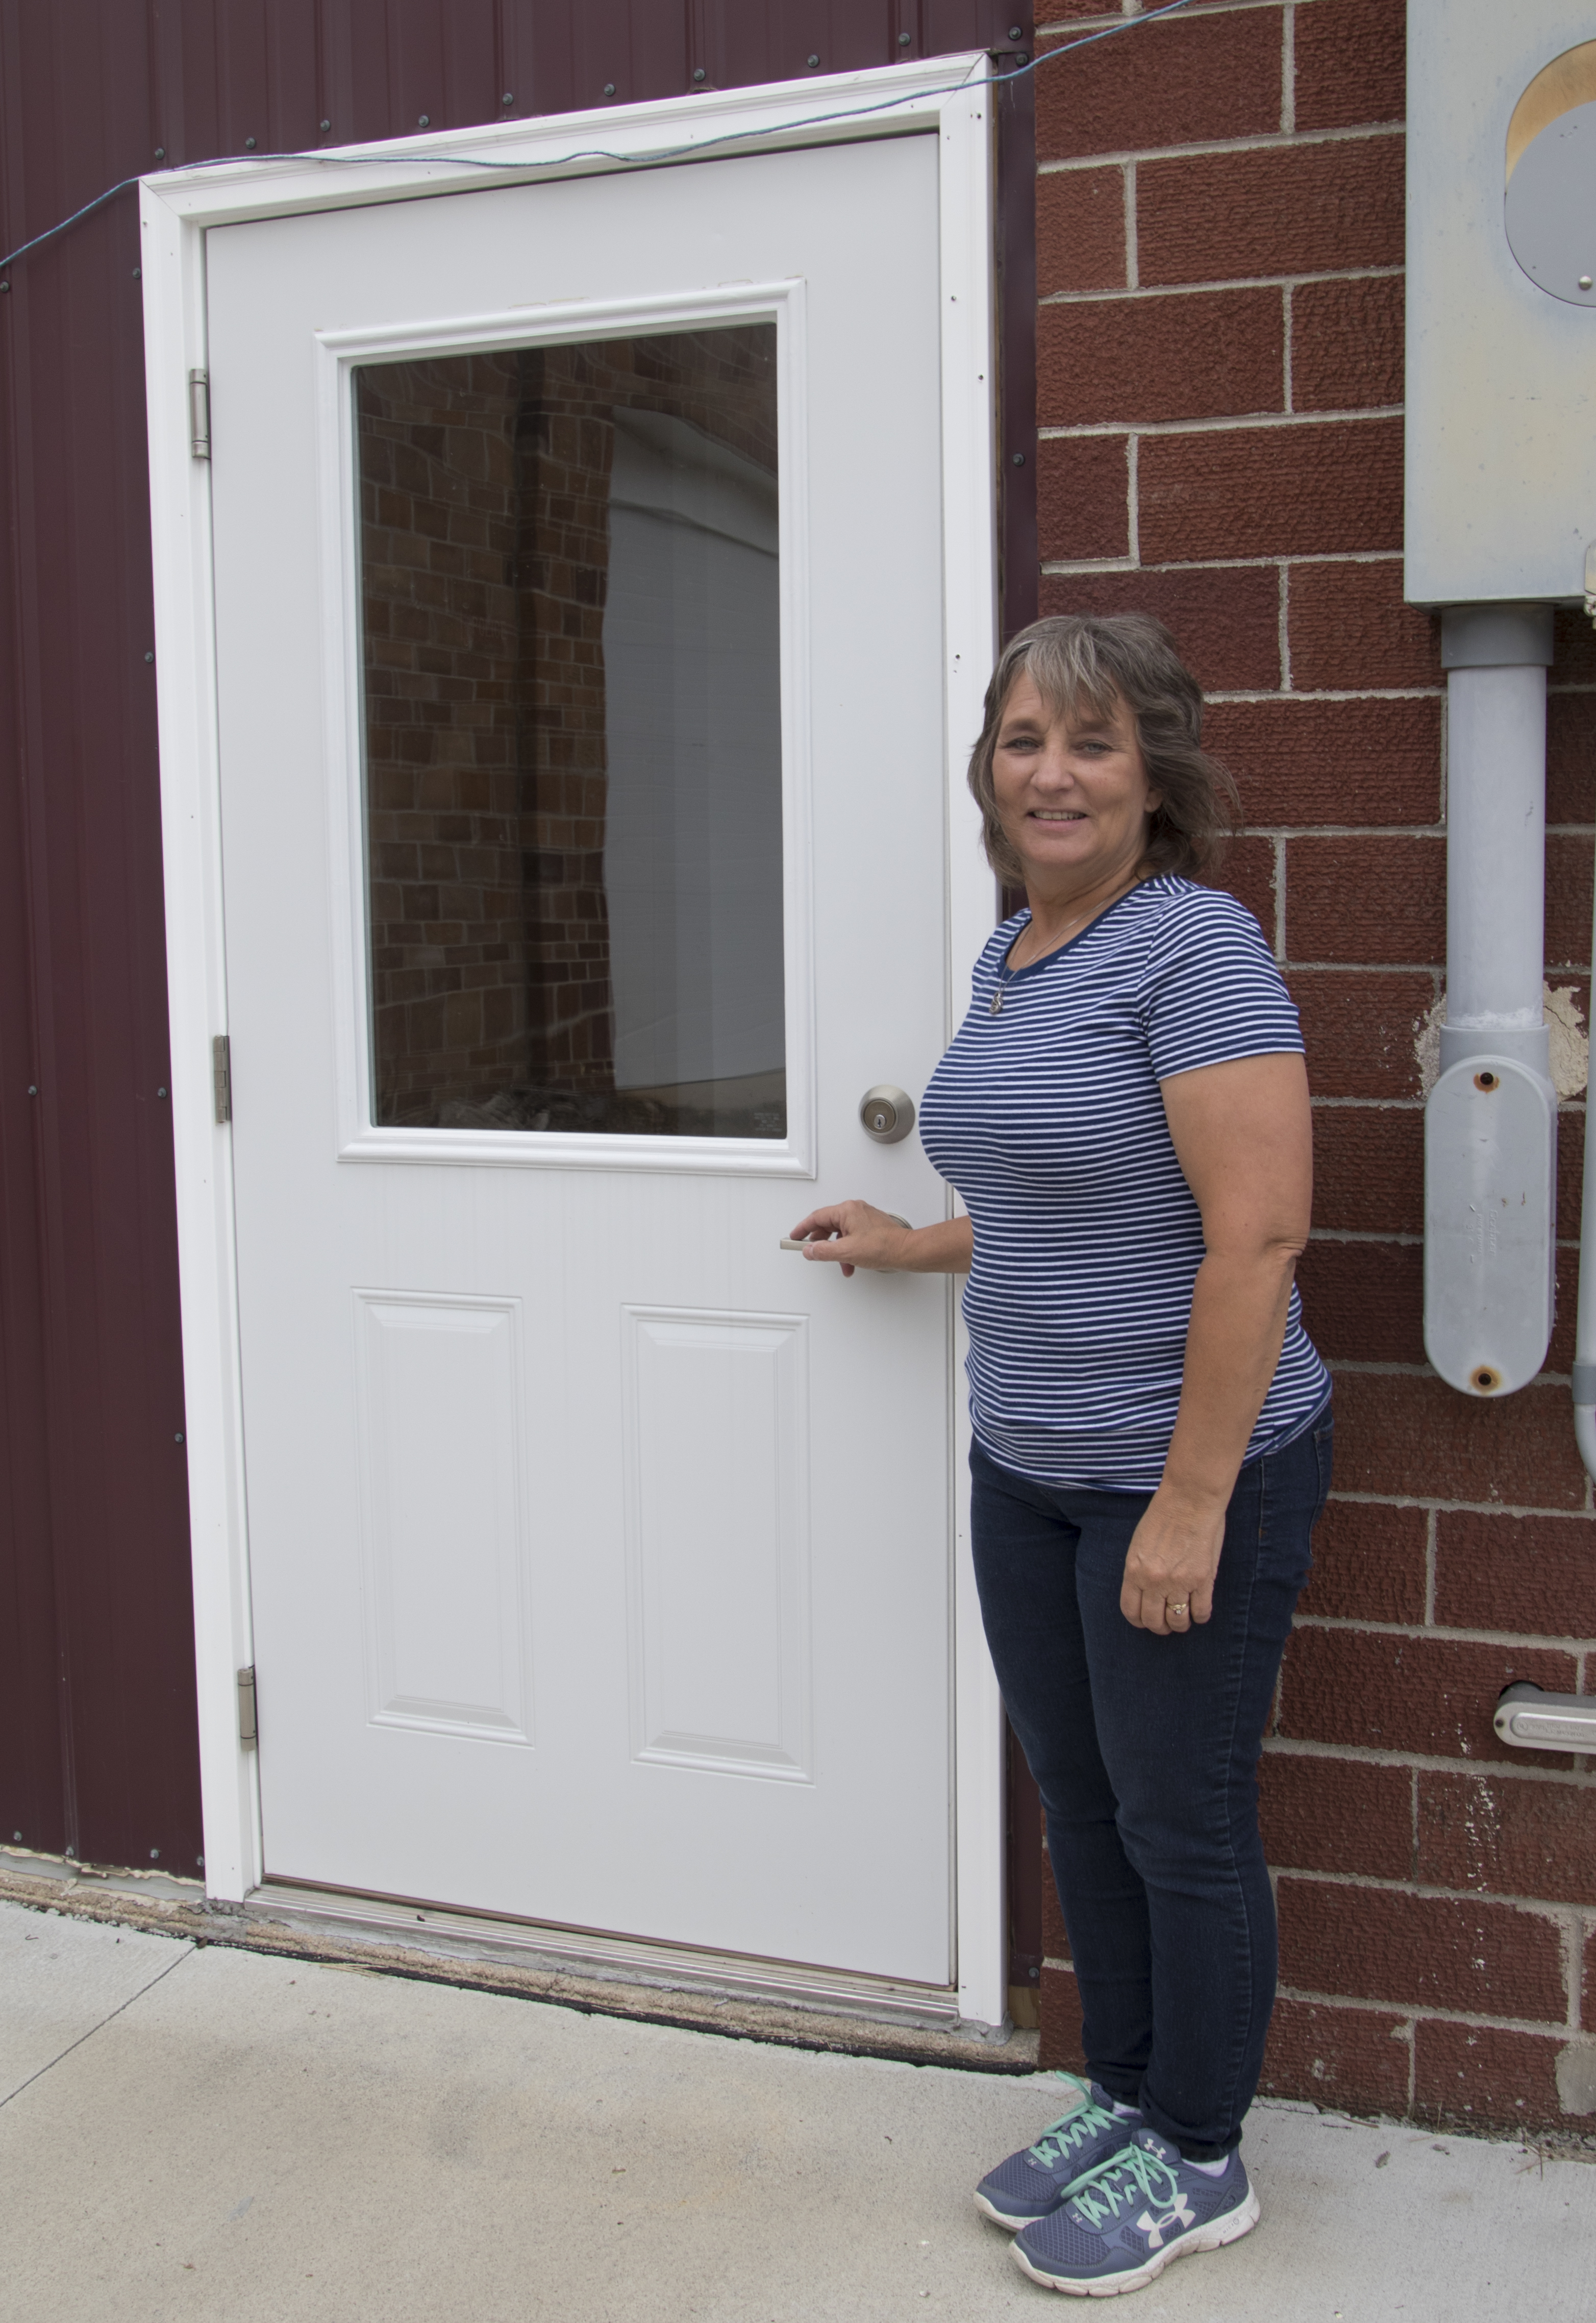 Village of Howells has new door thanks to Lean on LARM grant